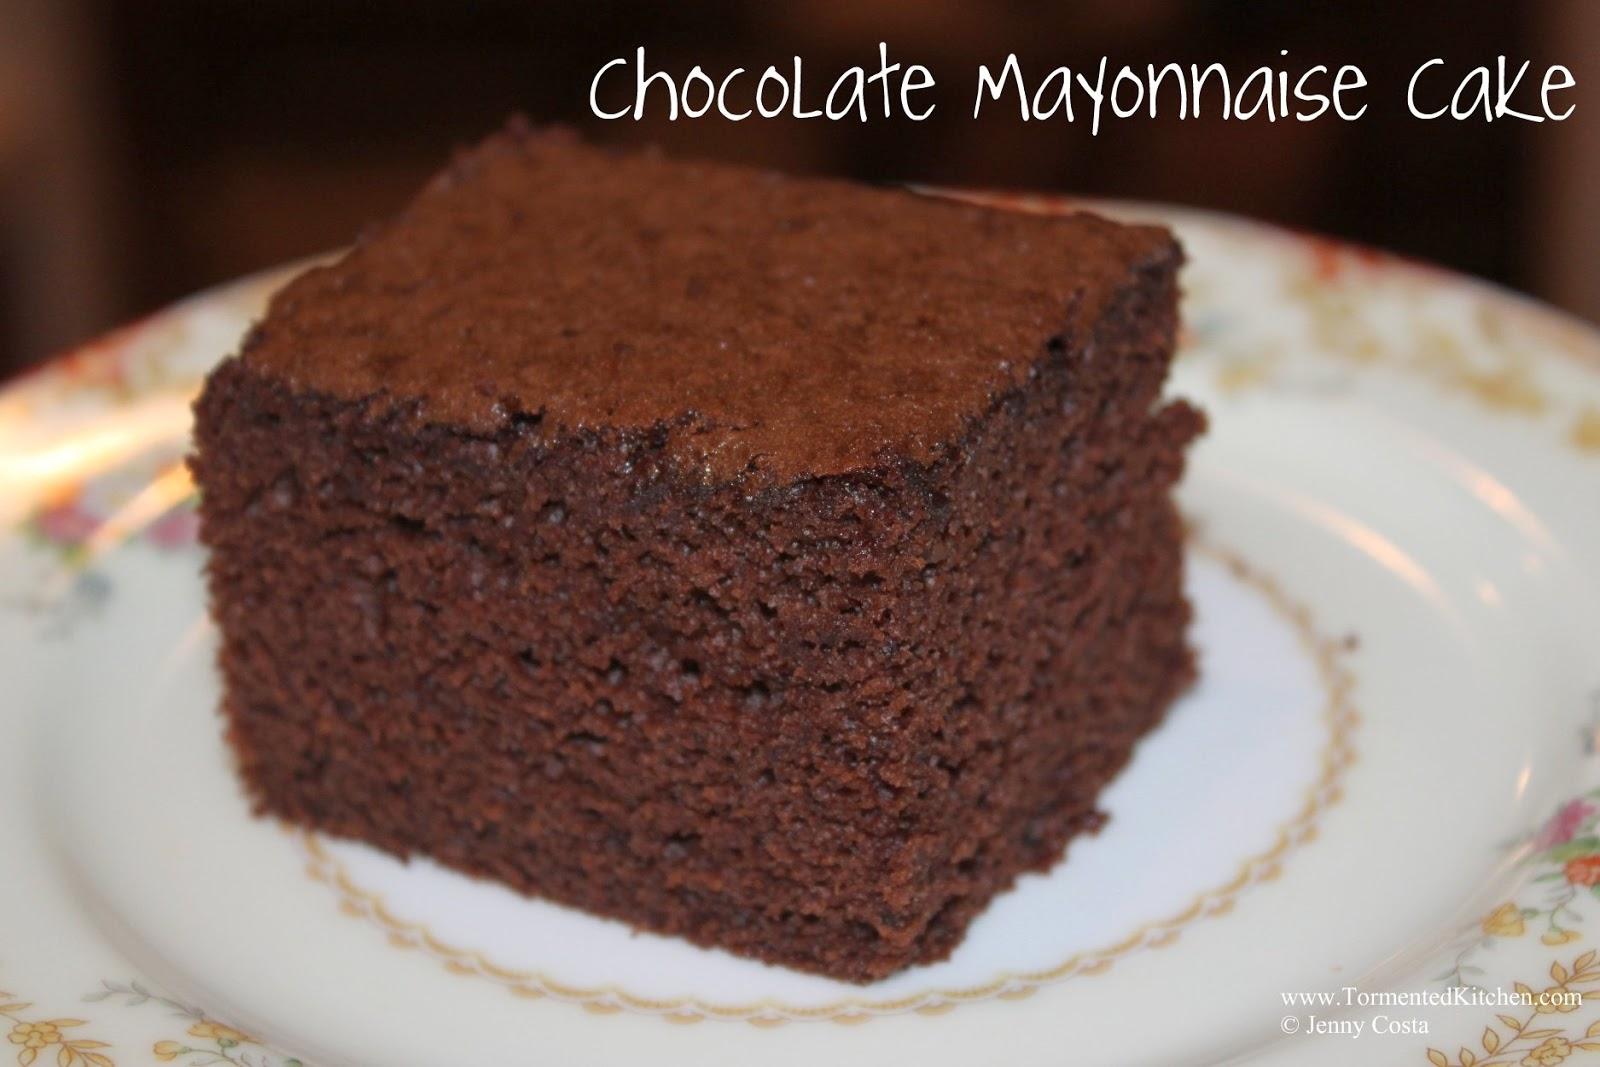 Tormented Kitchen: Chocolate Mayonnaise Cake